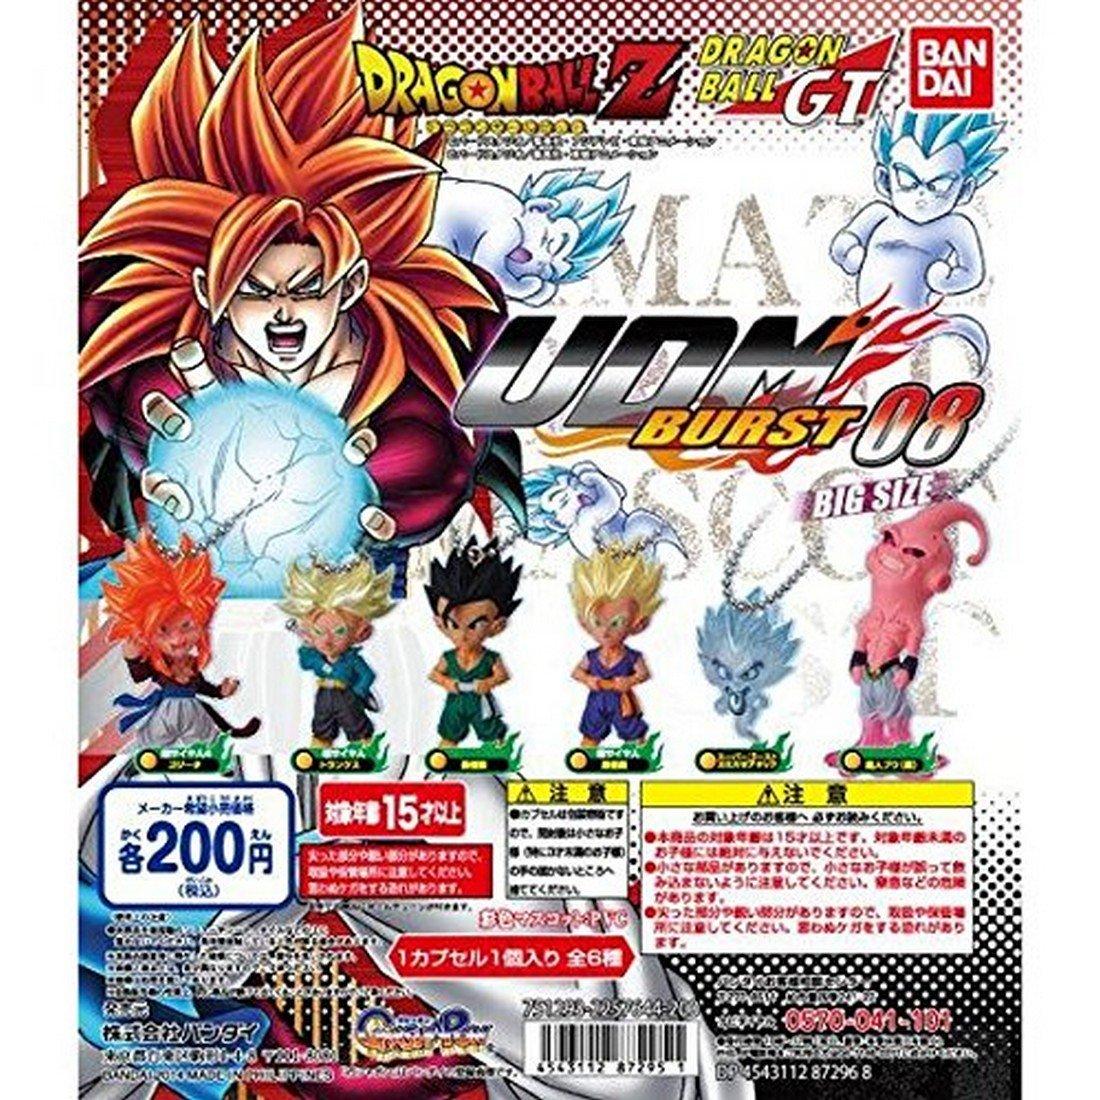 Dragon Ball Kai~UDM The Burst 08~ Figure Swing Keychain~S.s Son Gohan